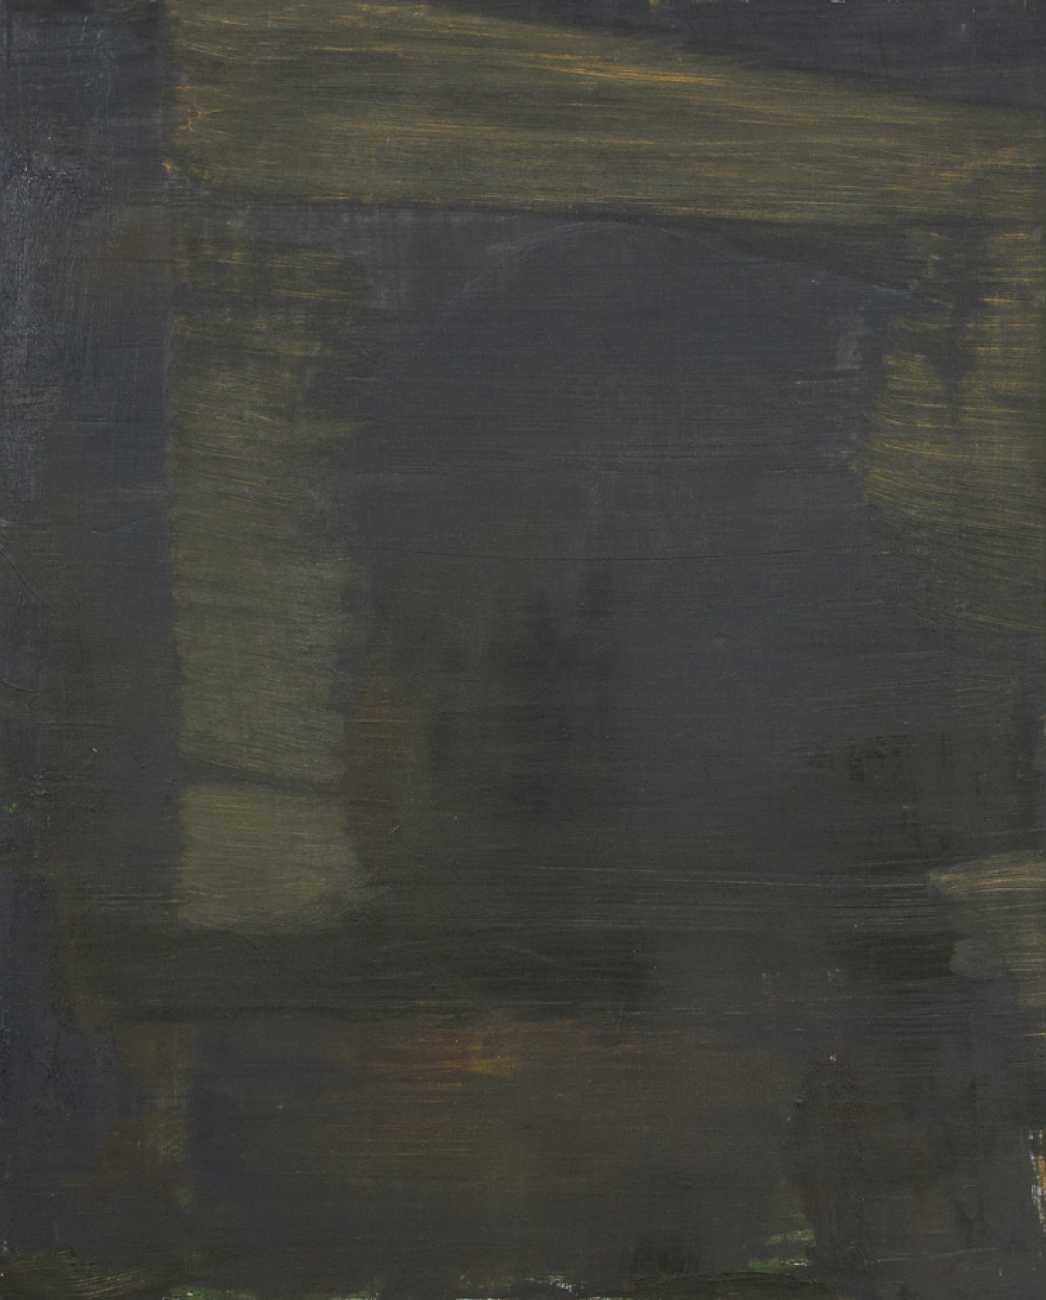 Andreas Eriksson  Skugga 1  2010 Oil on panel 75 x 60 cm